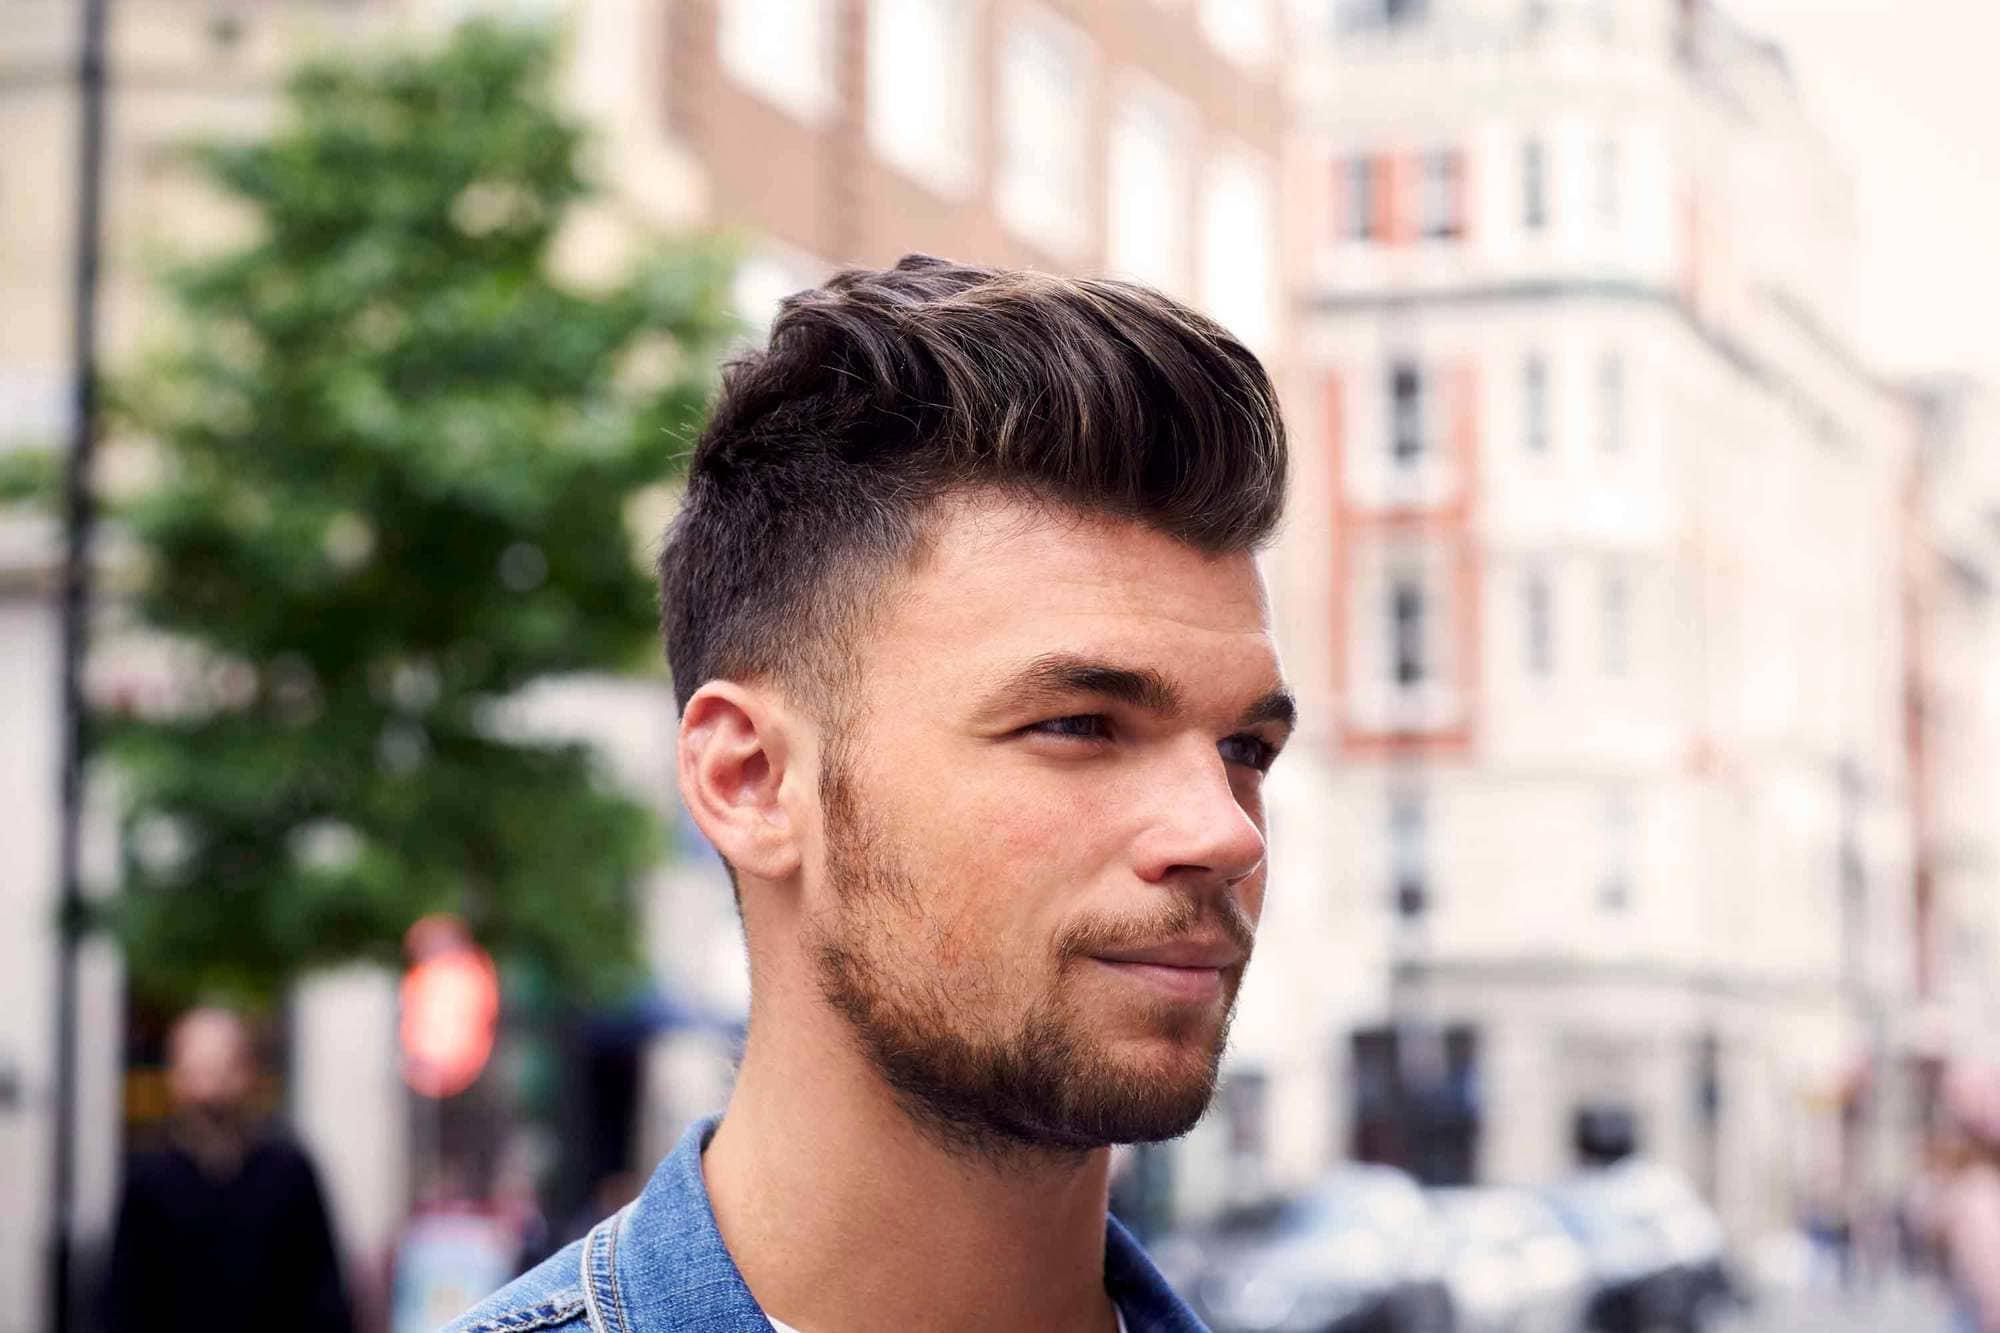 7 Handsome Curly Men's Undercut Hairstyles Throughout Undercut Hairstyles For Curly Hair (View 18 of 25)